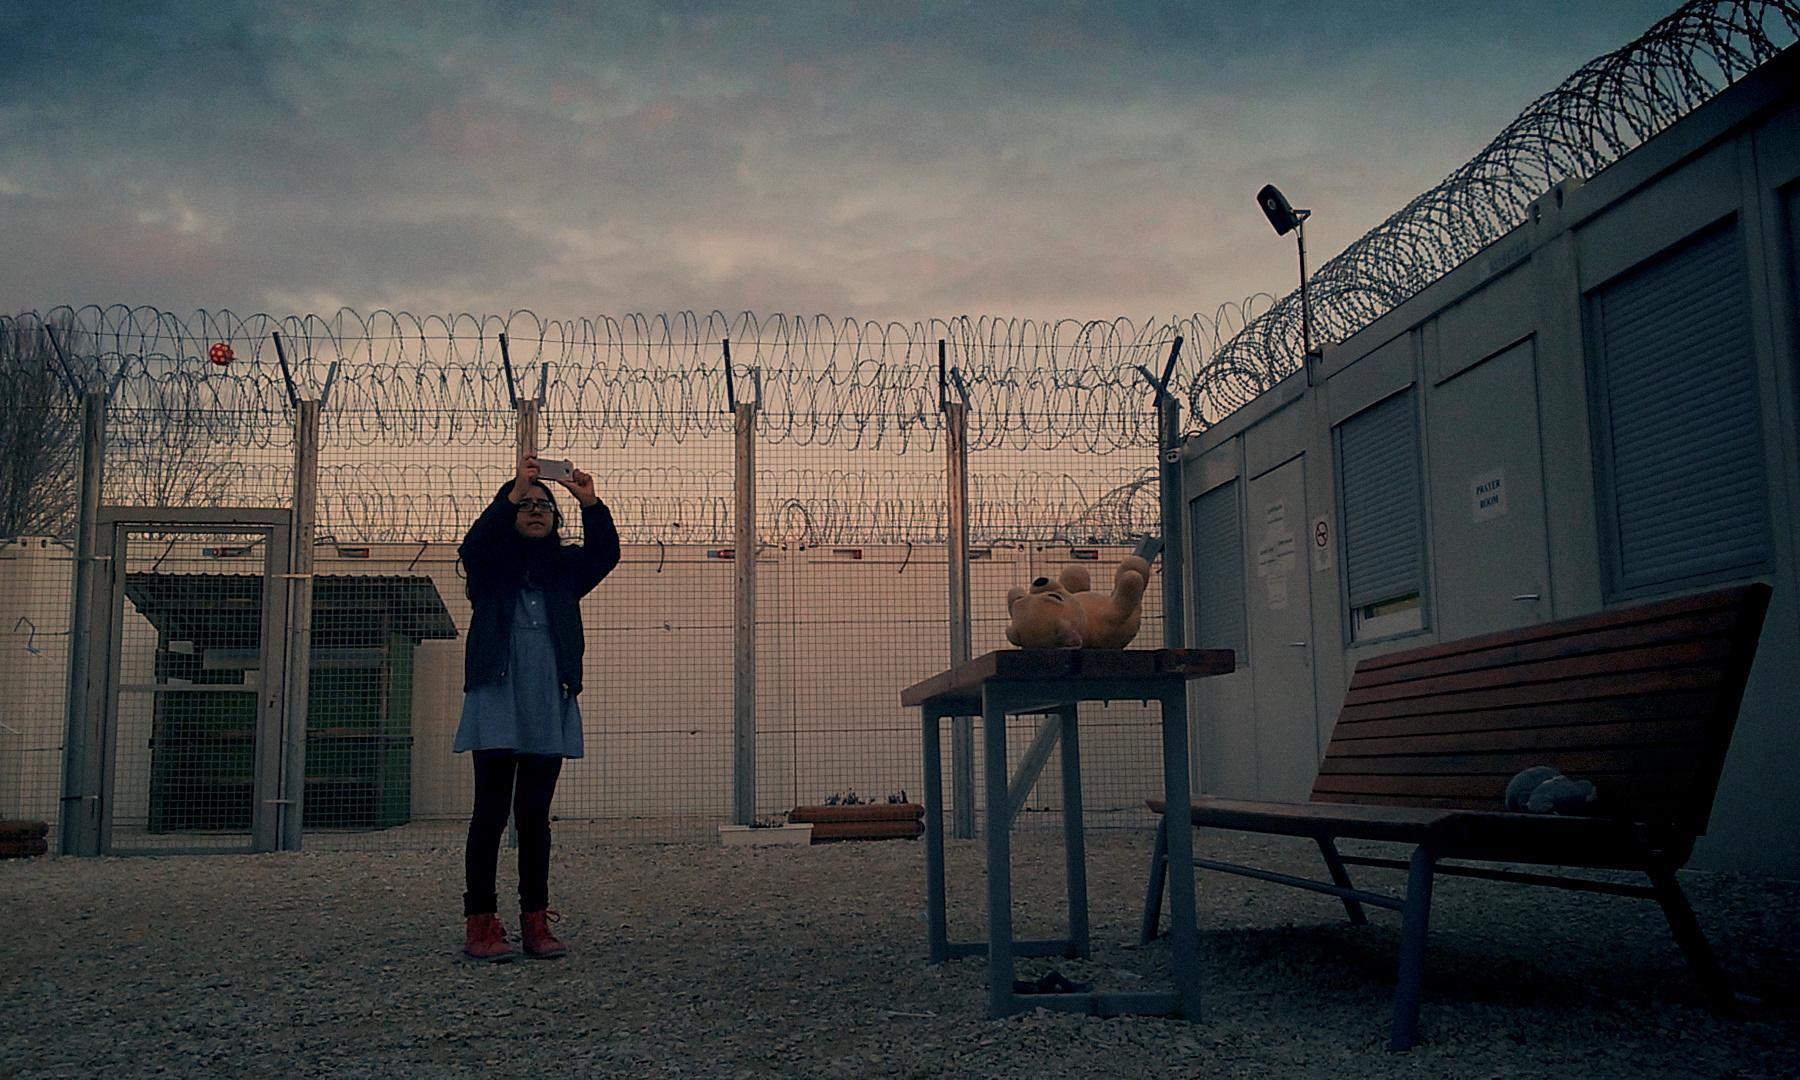 Midnight Traveler: a powerful refugee documentary filmed on a phone